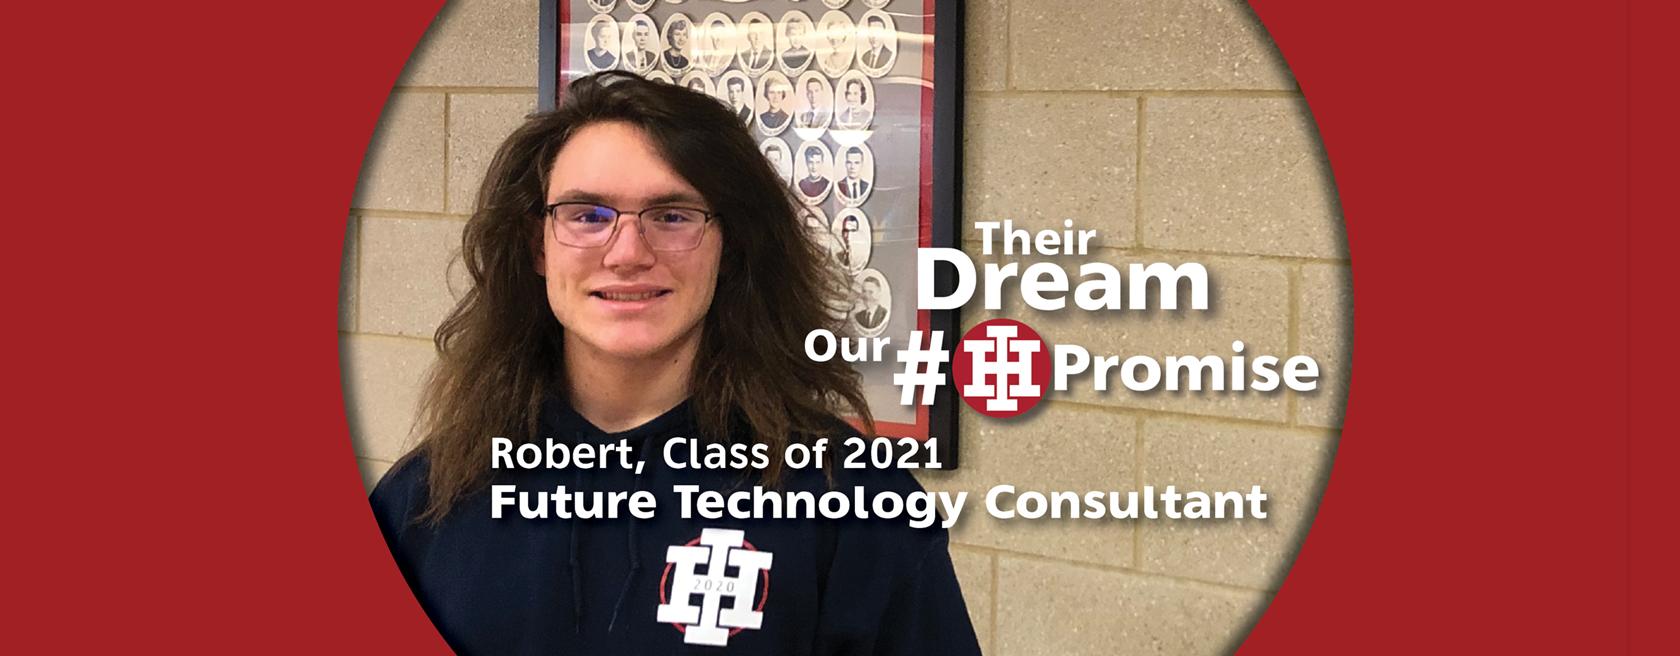 IHHS Student Robert